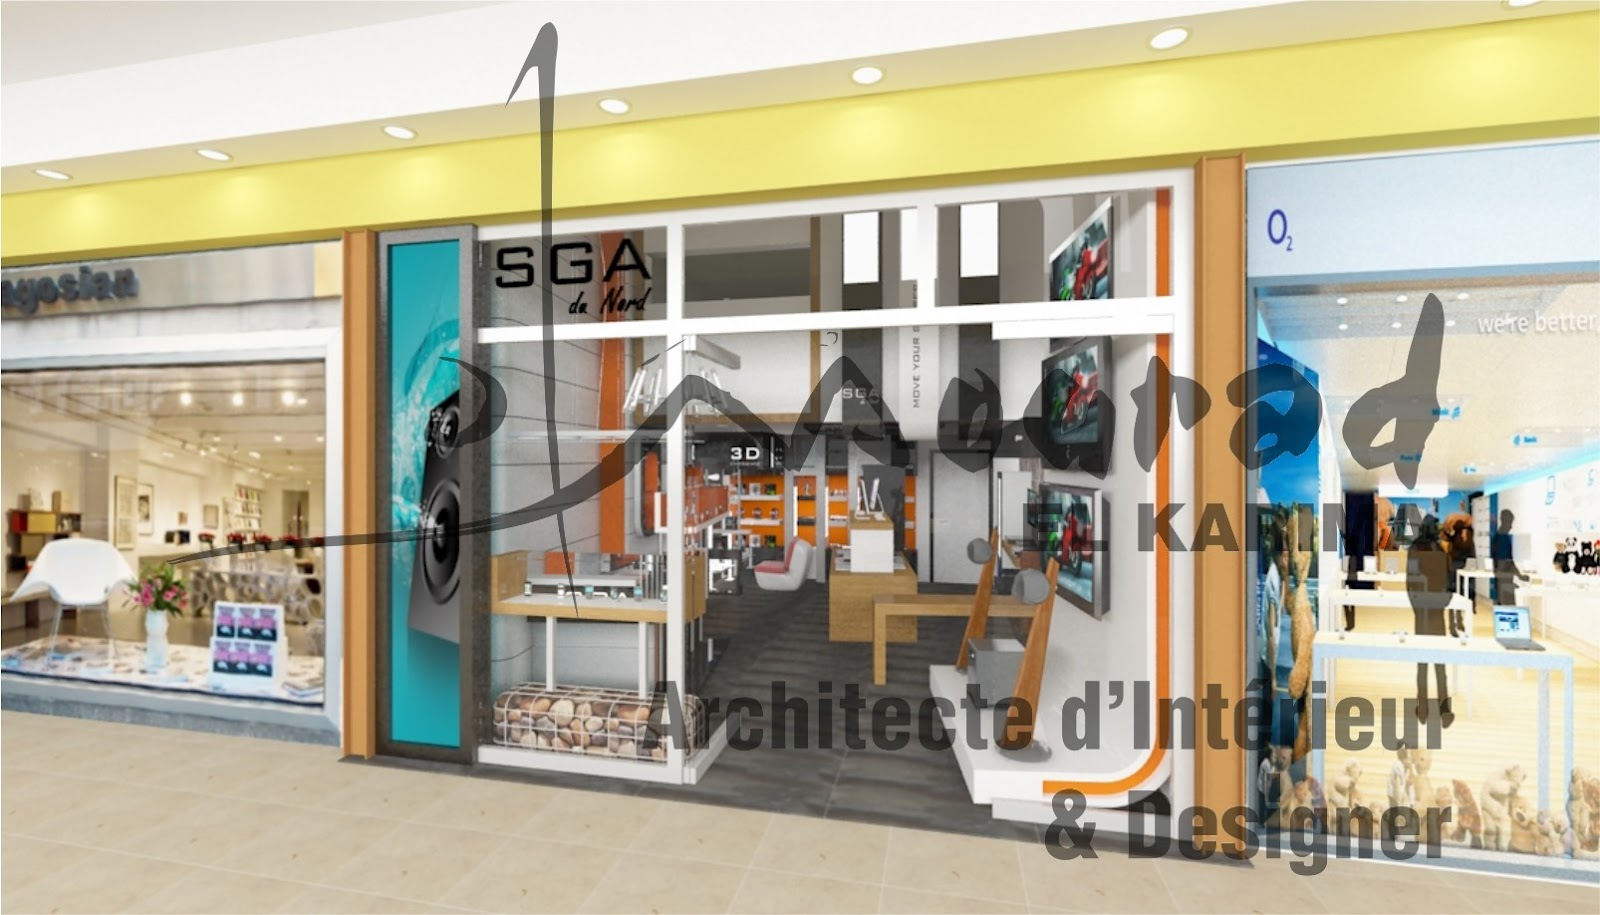 mourad el karima architecte d 39 interieur designer cb tec un espace d 39 envie high tech tanger. Black Bedroom Furniture Sets. Home Design Ideas